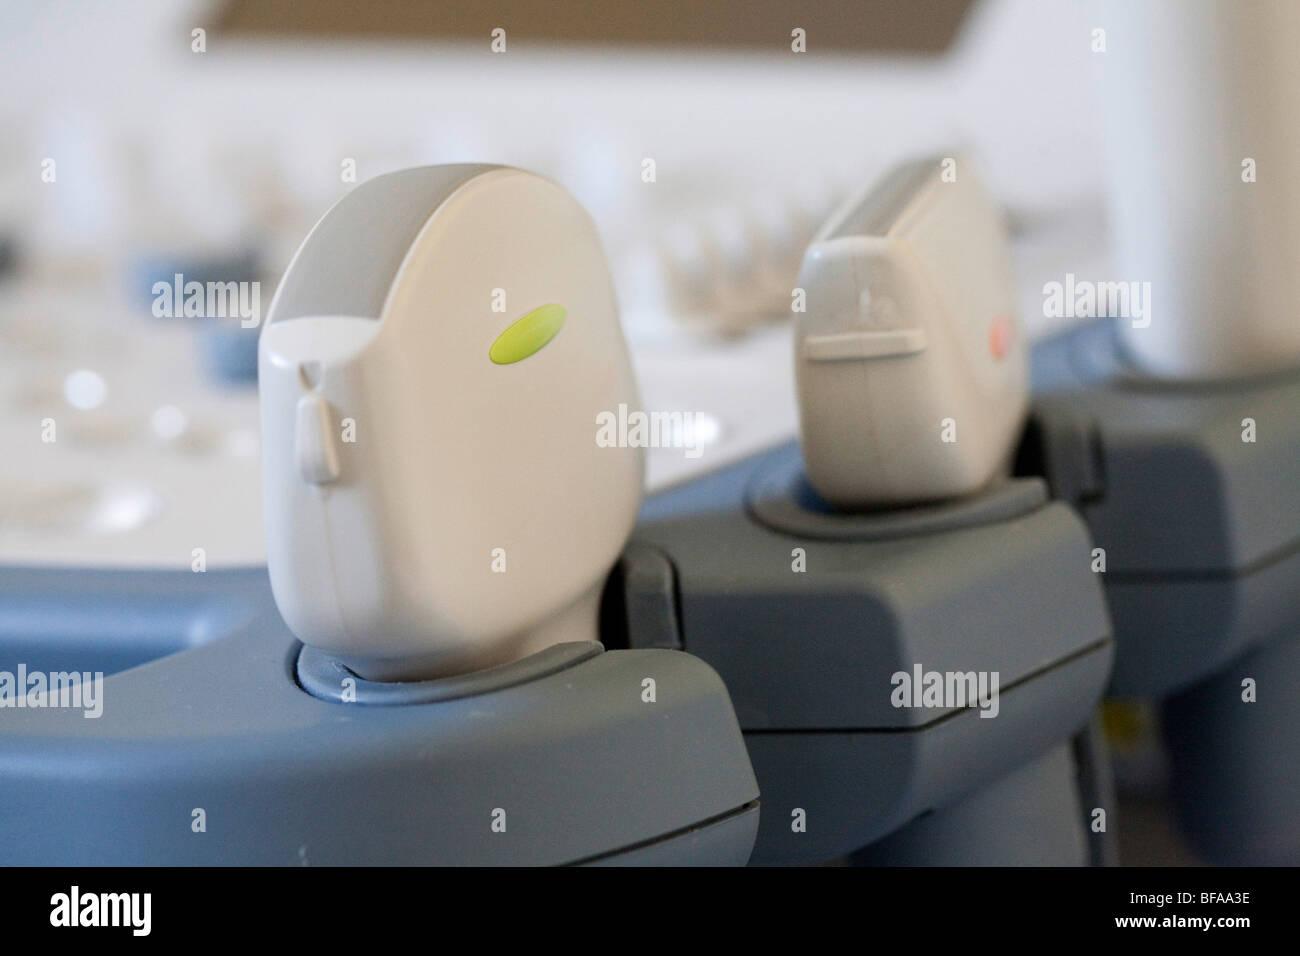 Ultrasound transducers. - Stock Image